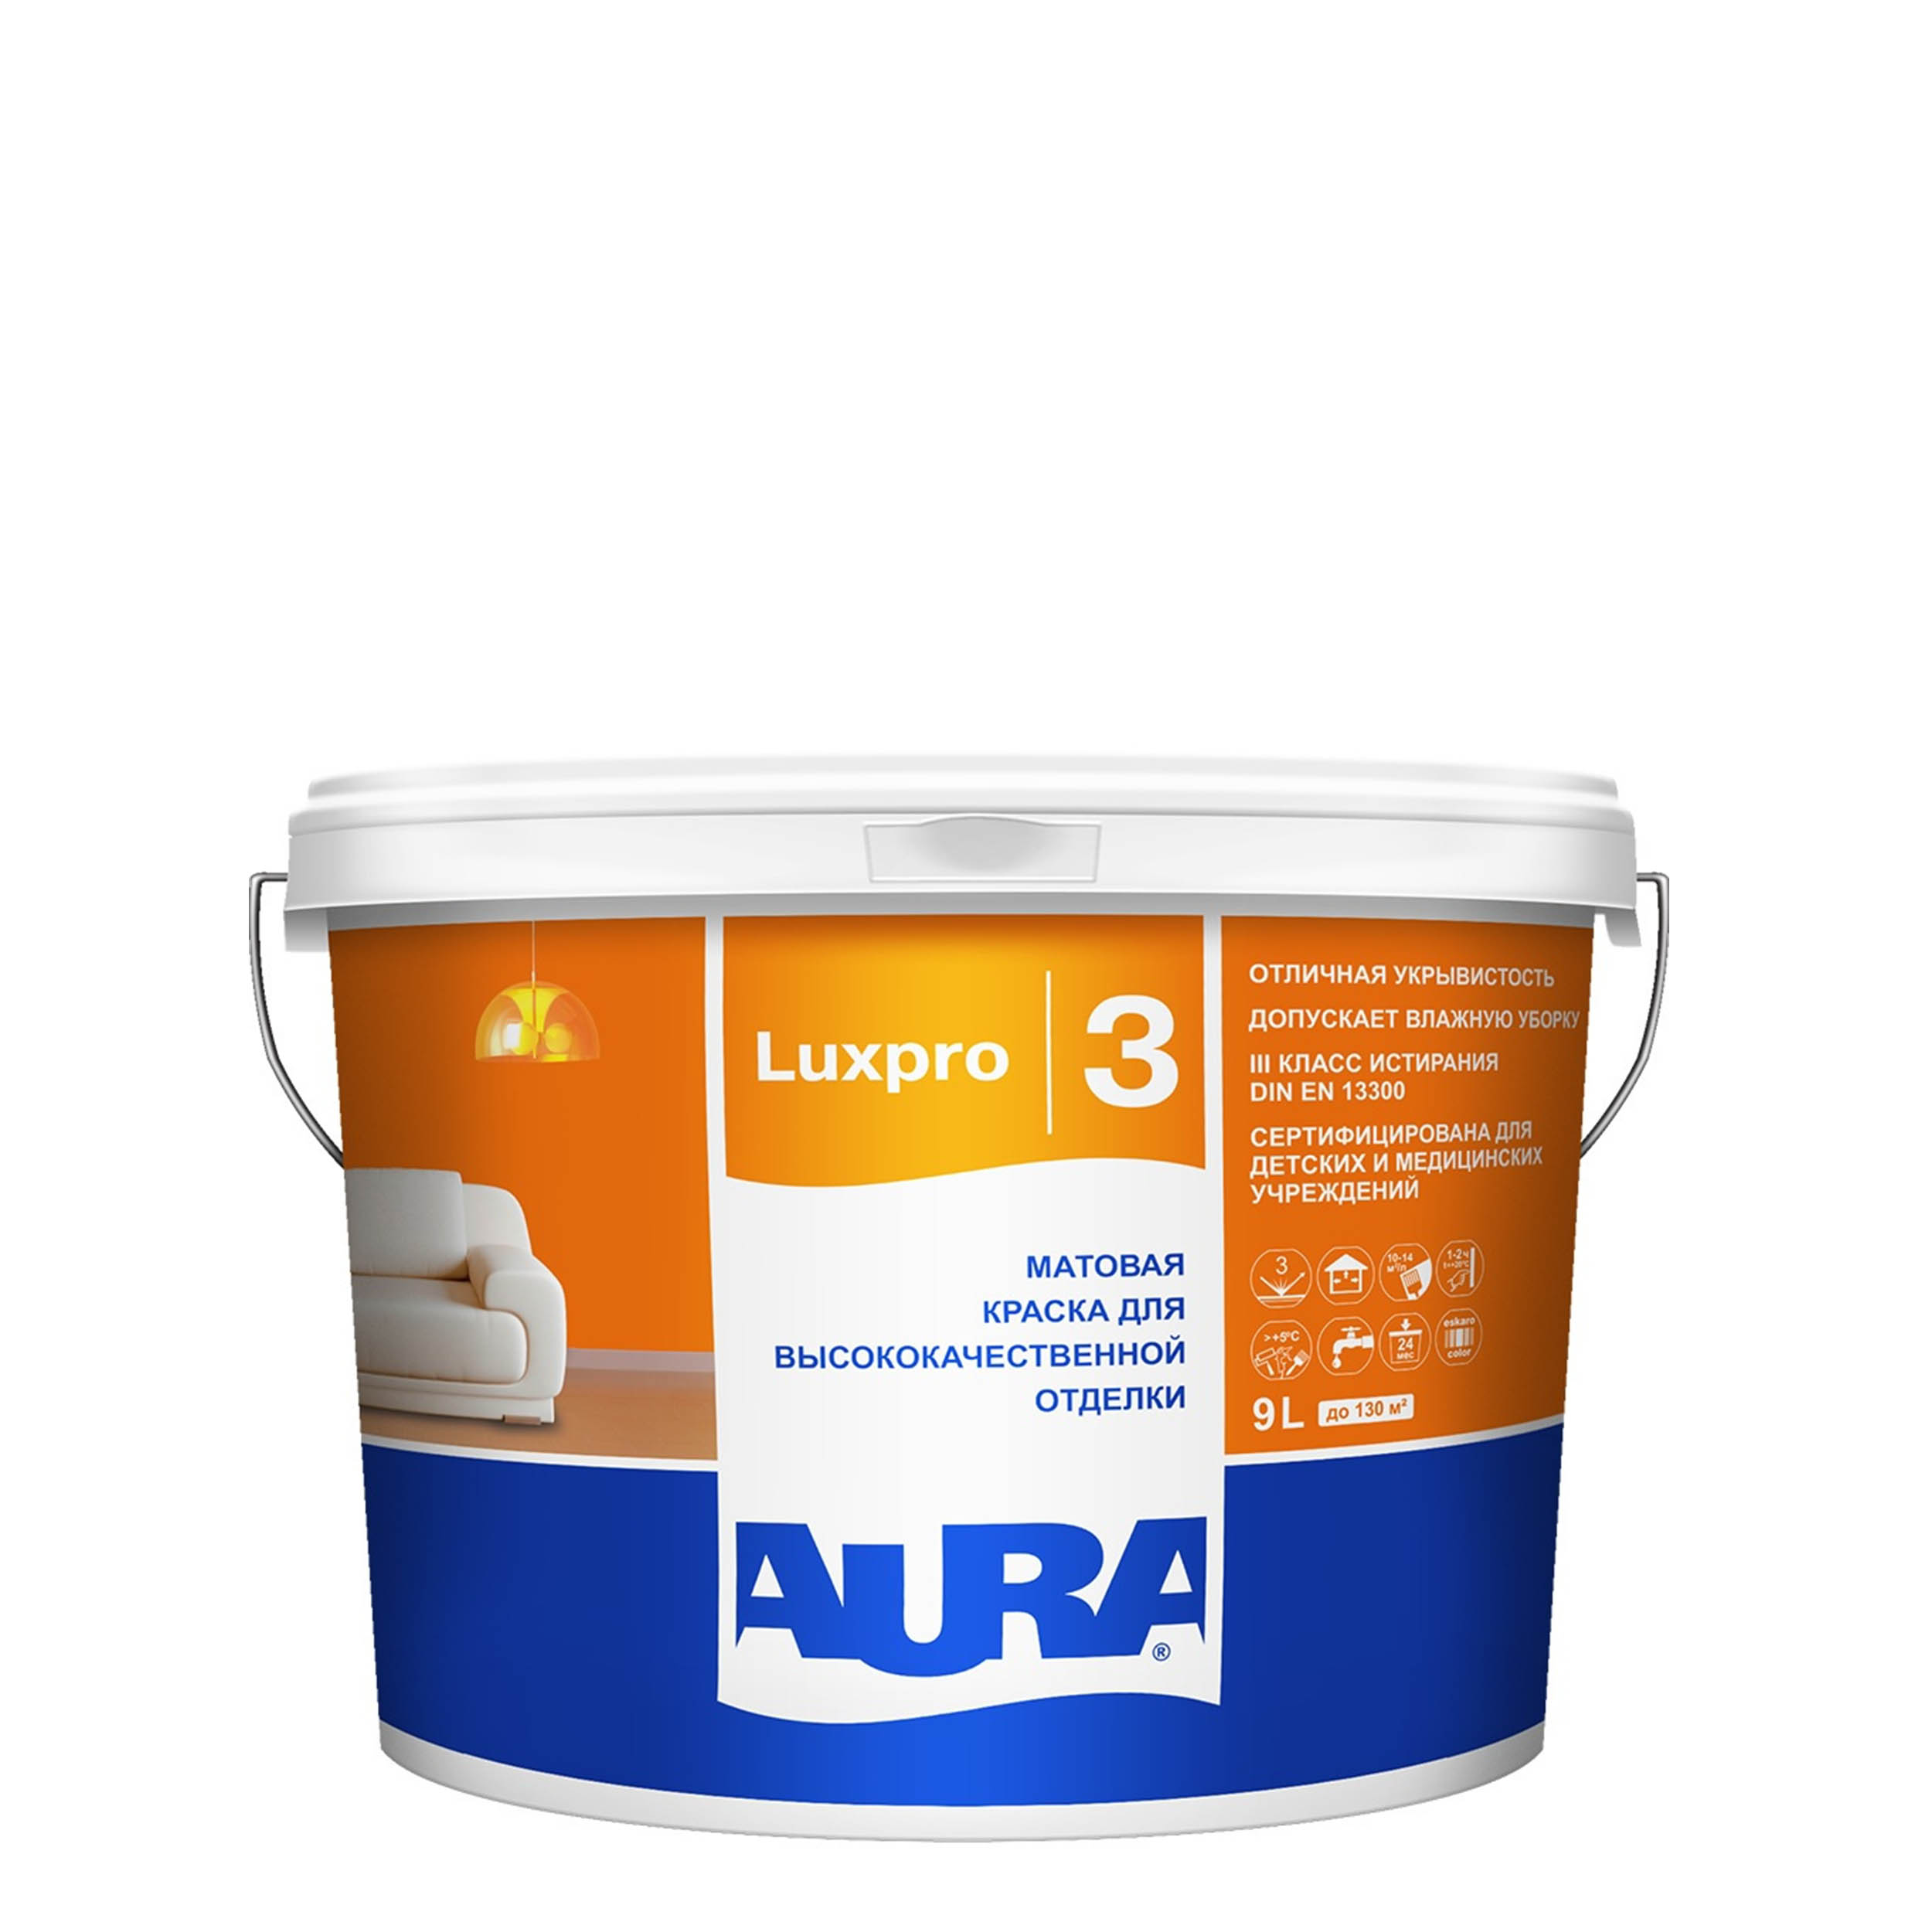 Фото 24 - Краска интерьерная, Aura LuxPRO 3, RAL 1032, 11 кг.